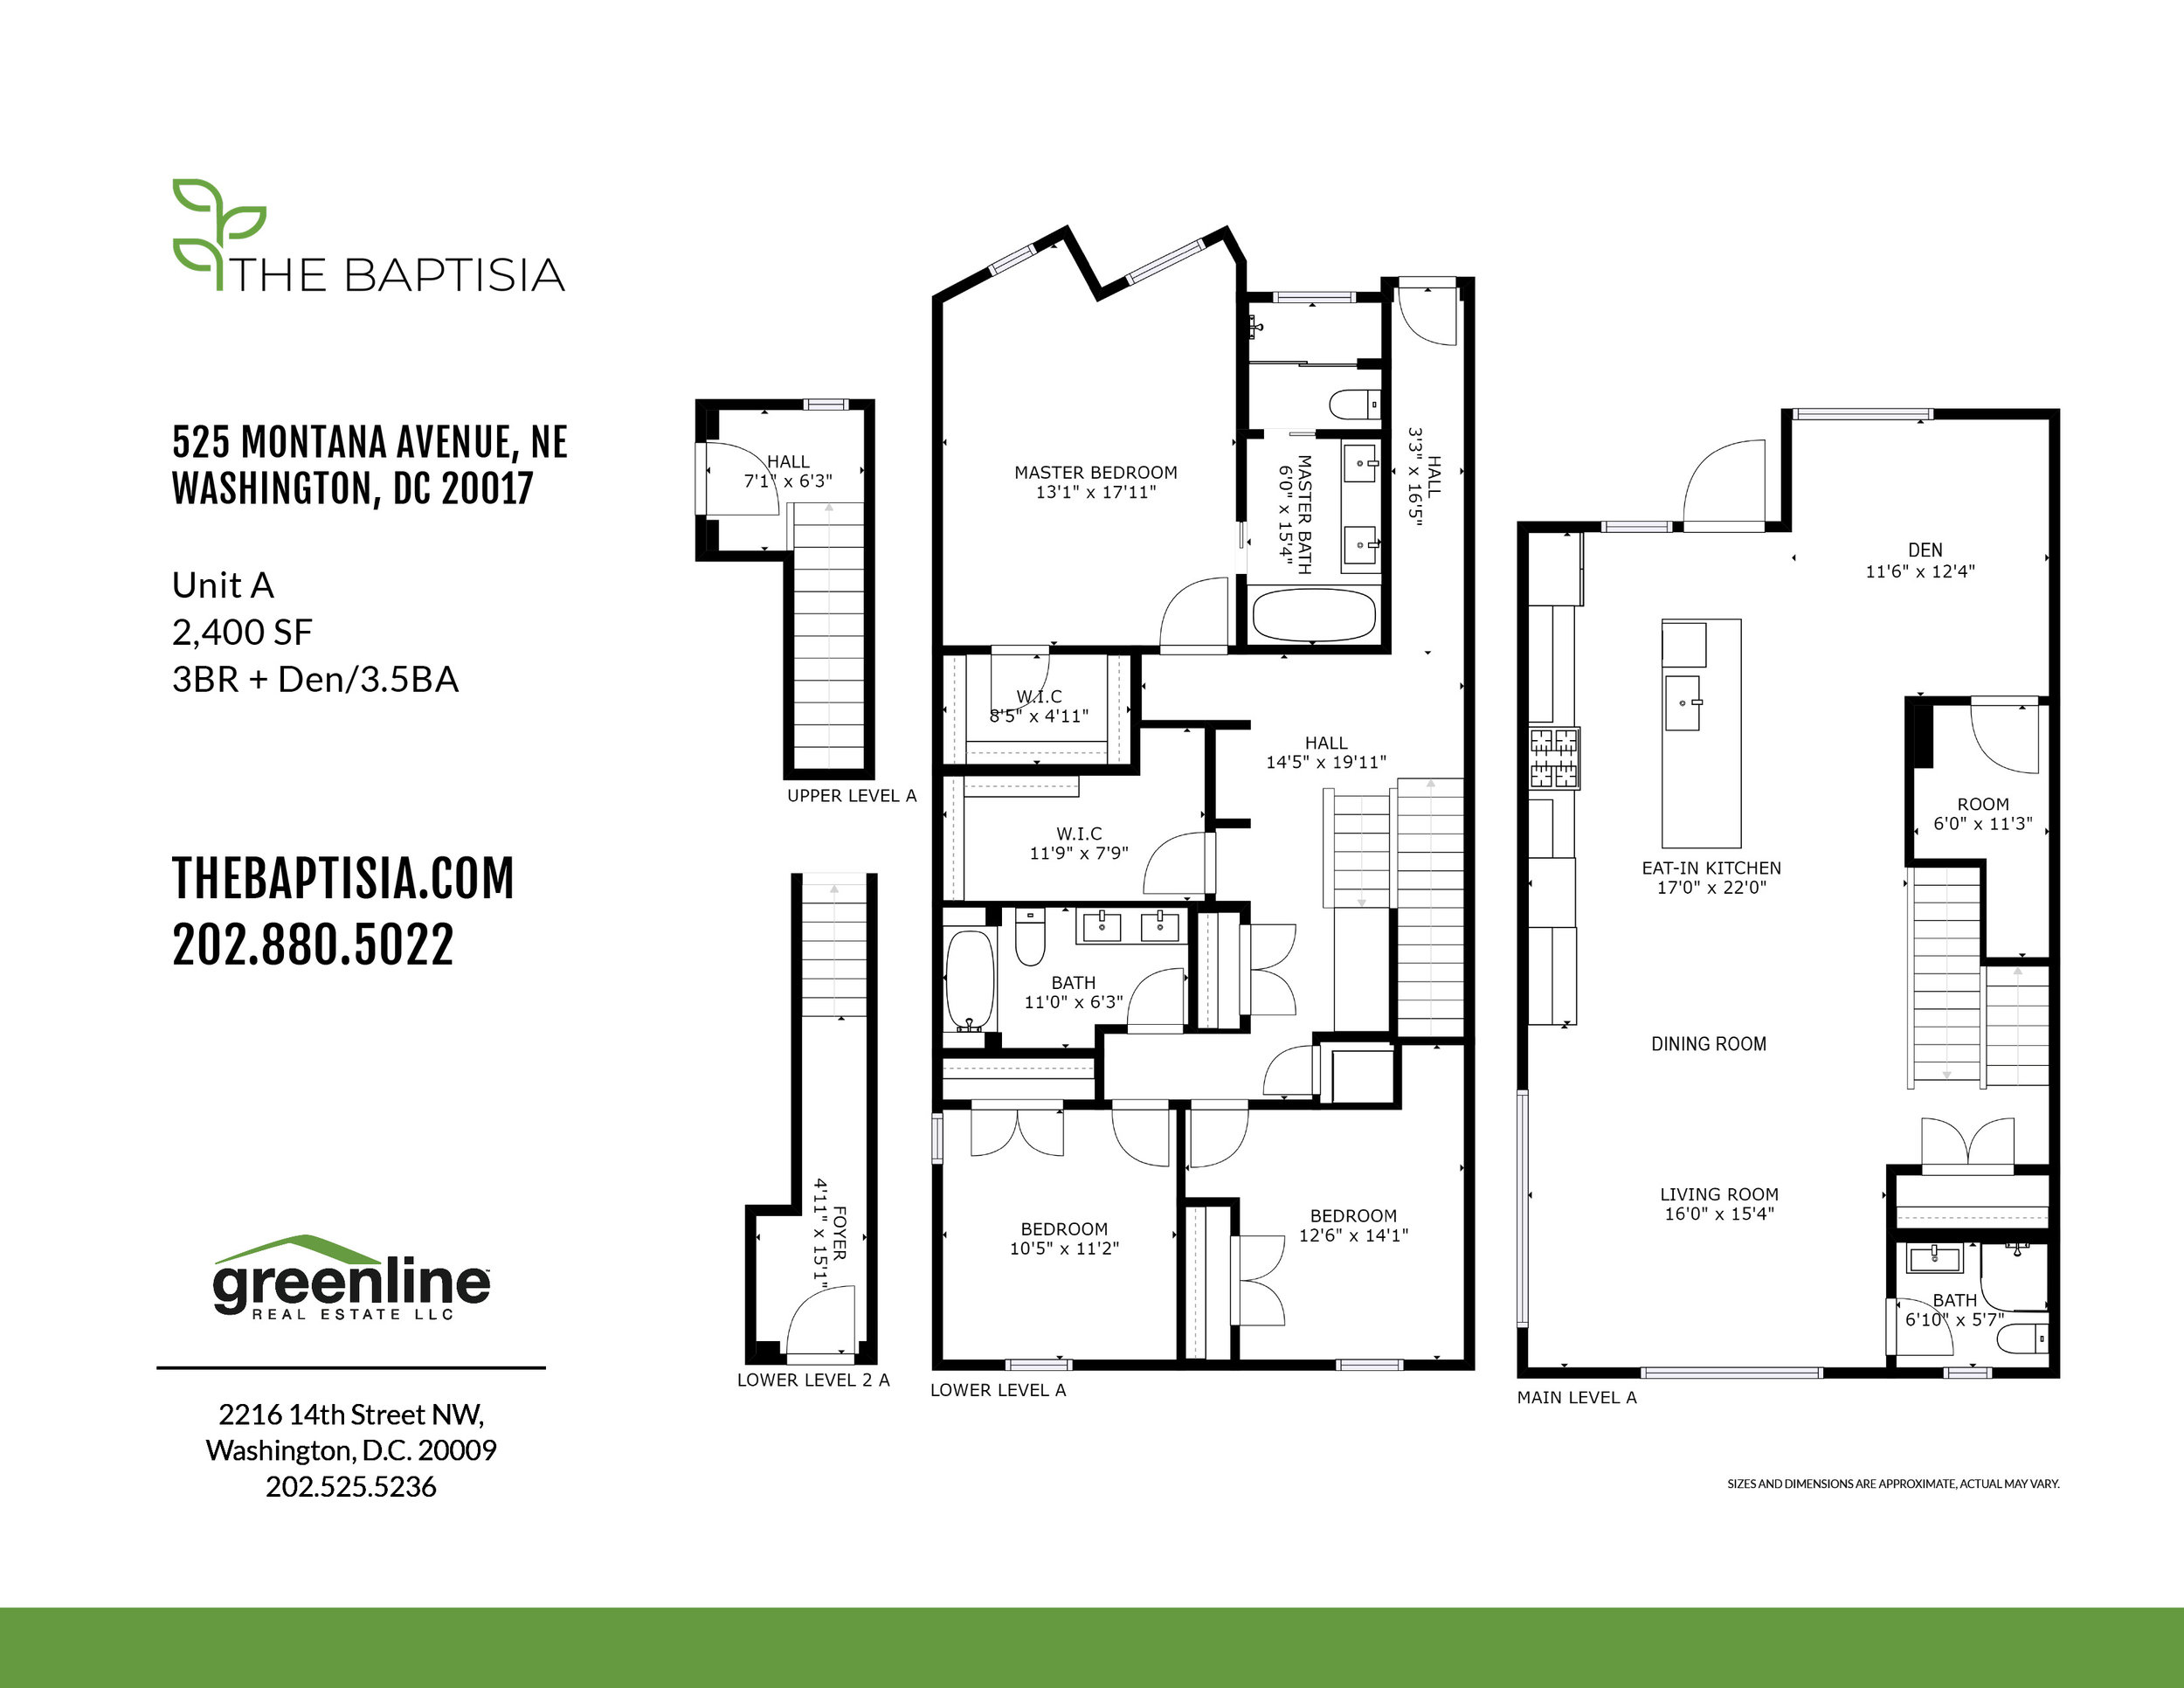 thebaptisia_floorplan_unit_a.jpg